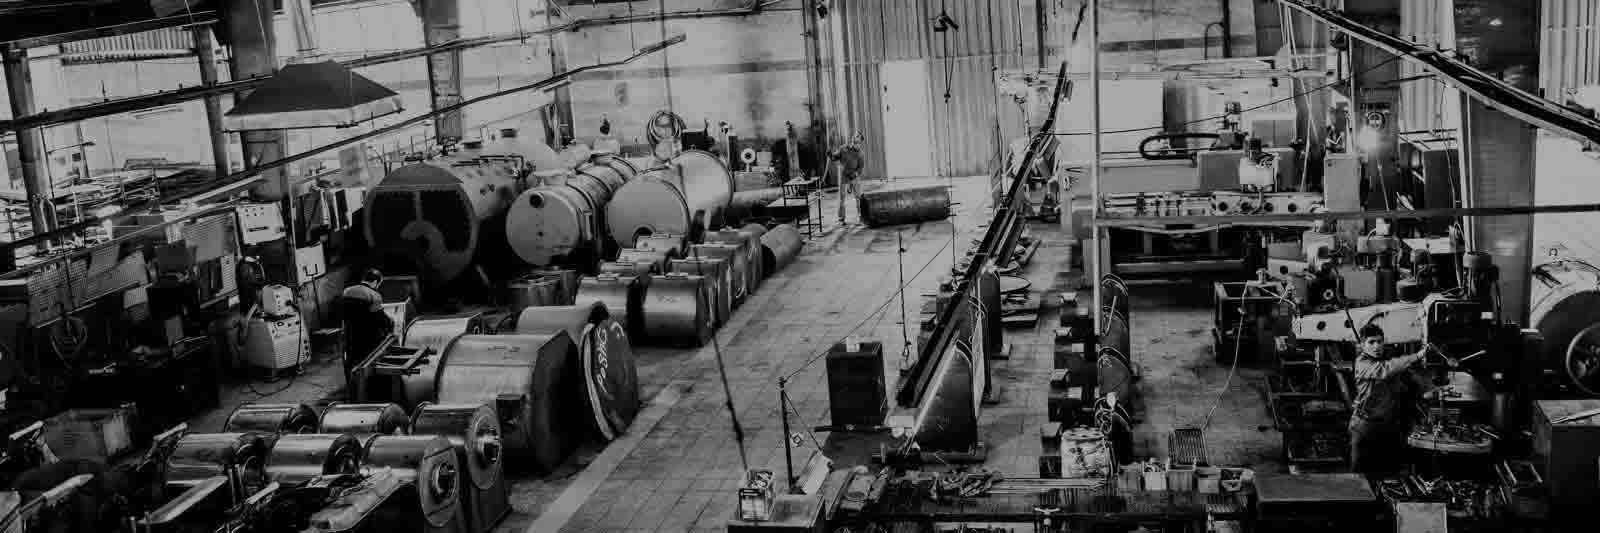 لباسشویی صنعتی